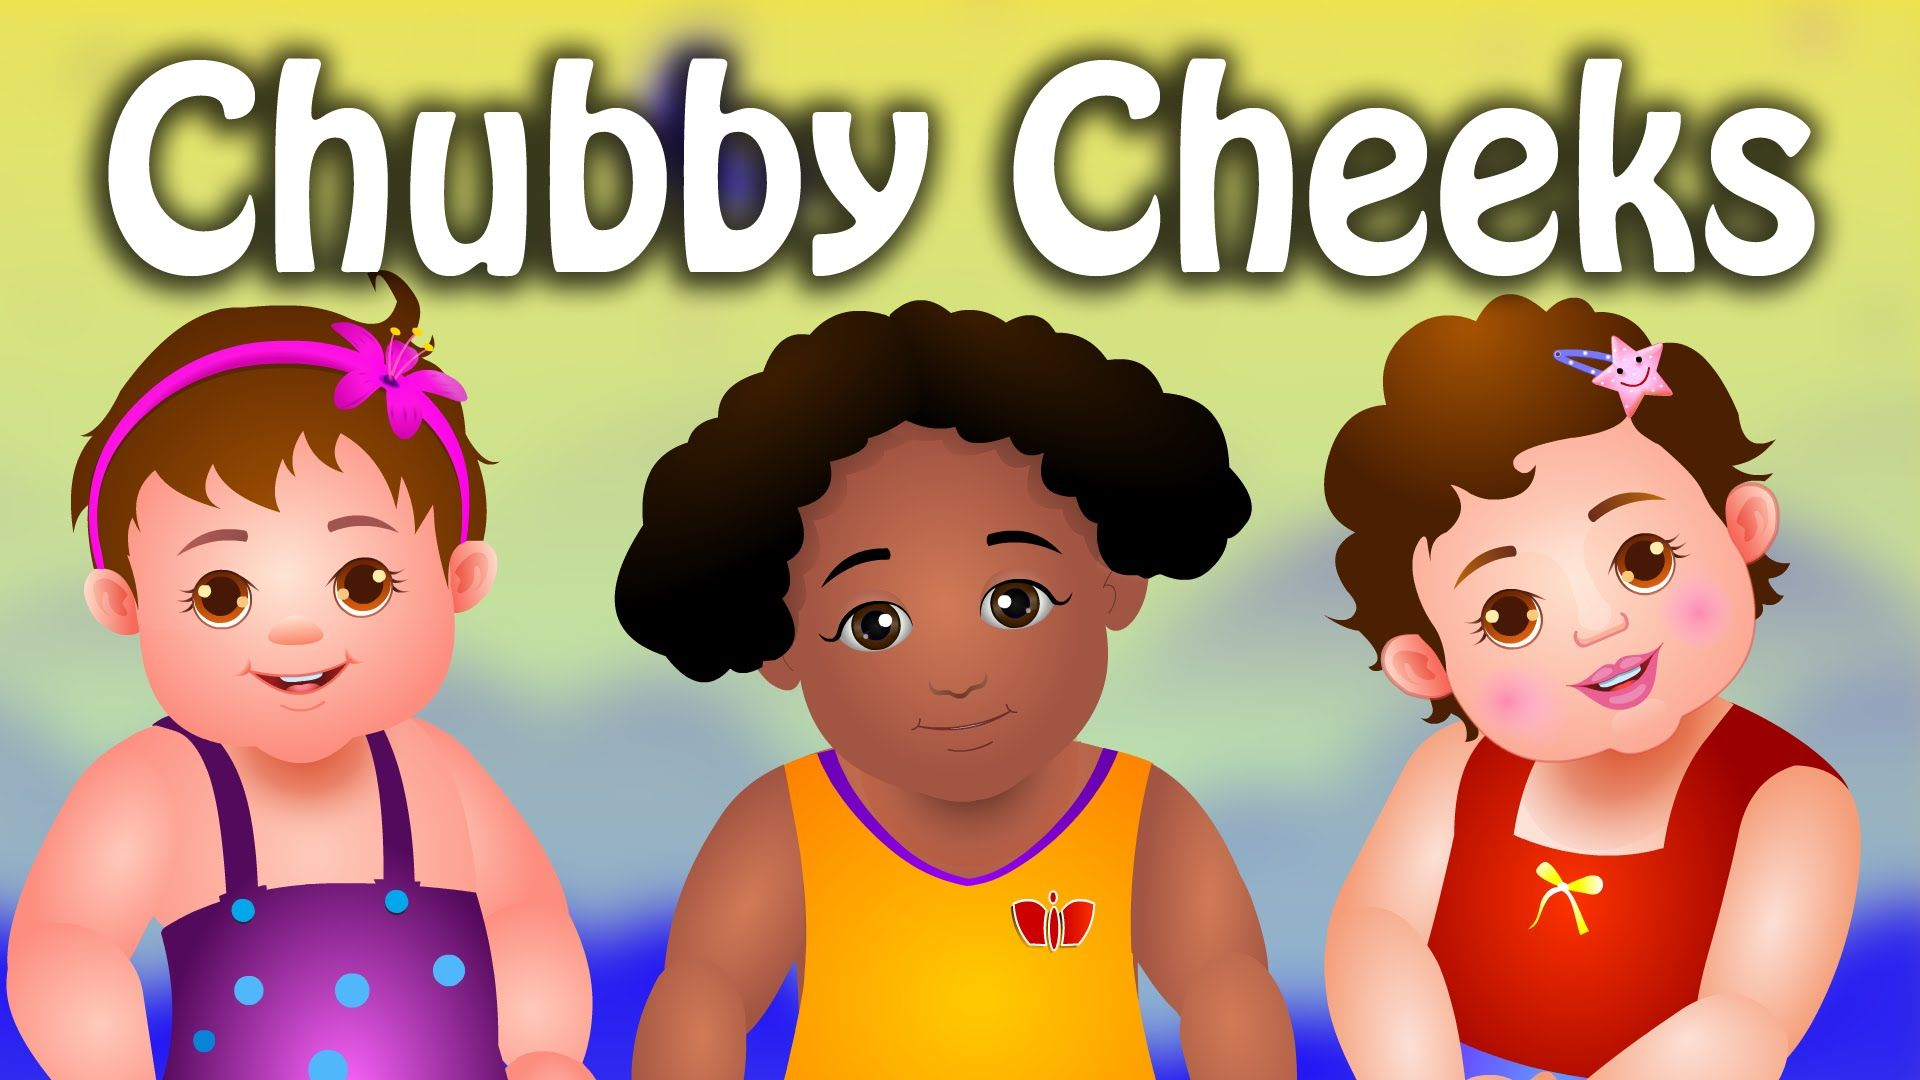 Chubby Cheeks, Dimple Chin Nursery Rhyme.